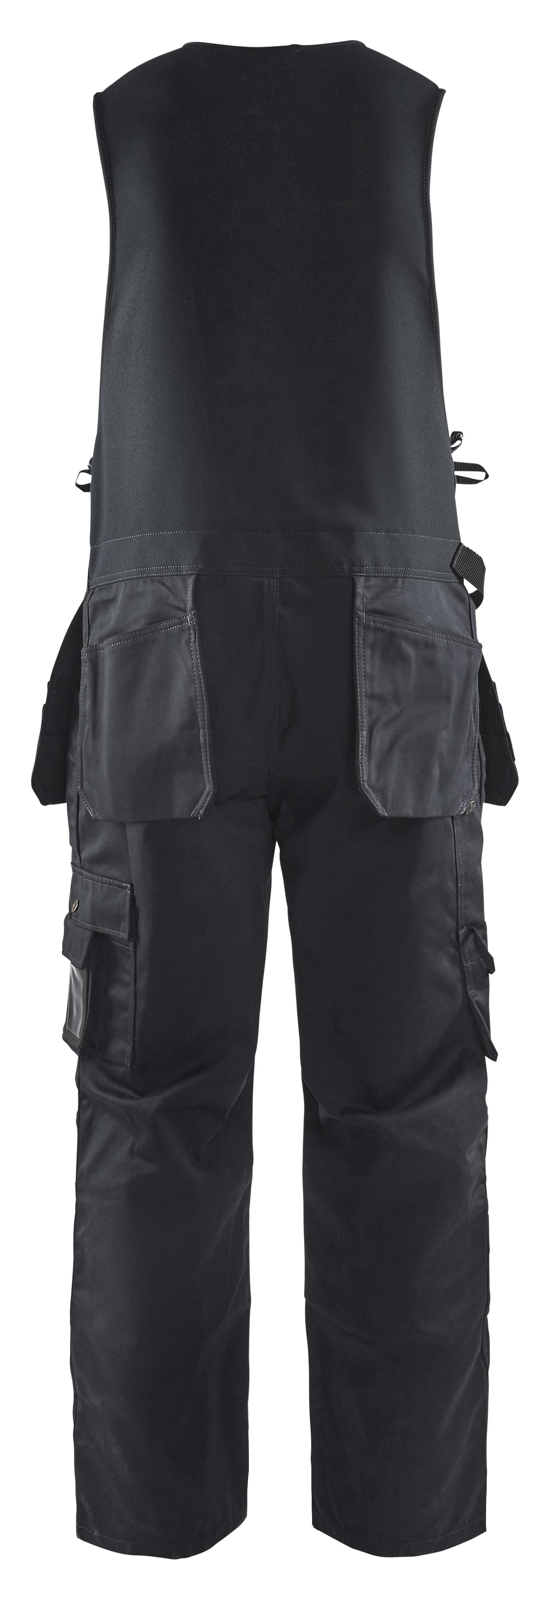 Blaklader Bodybroeken 26501860 zwart(9900)